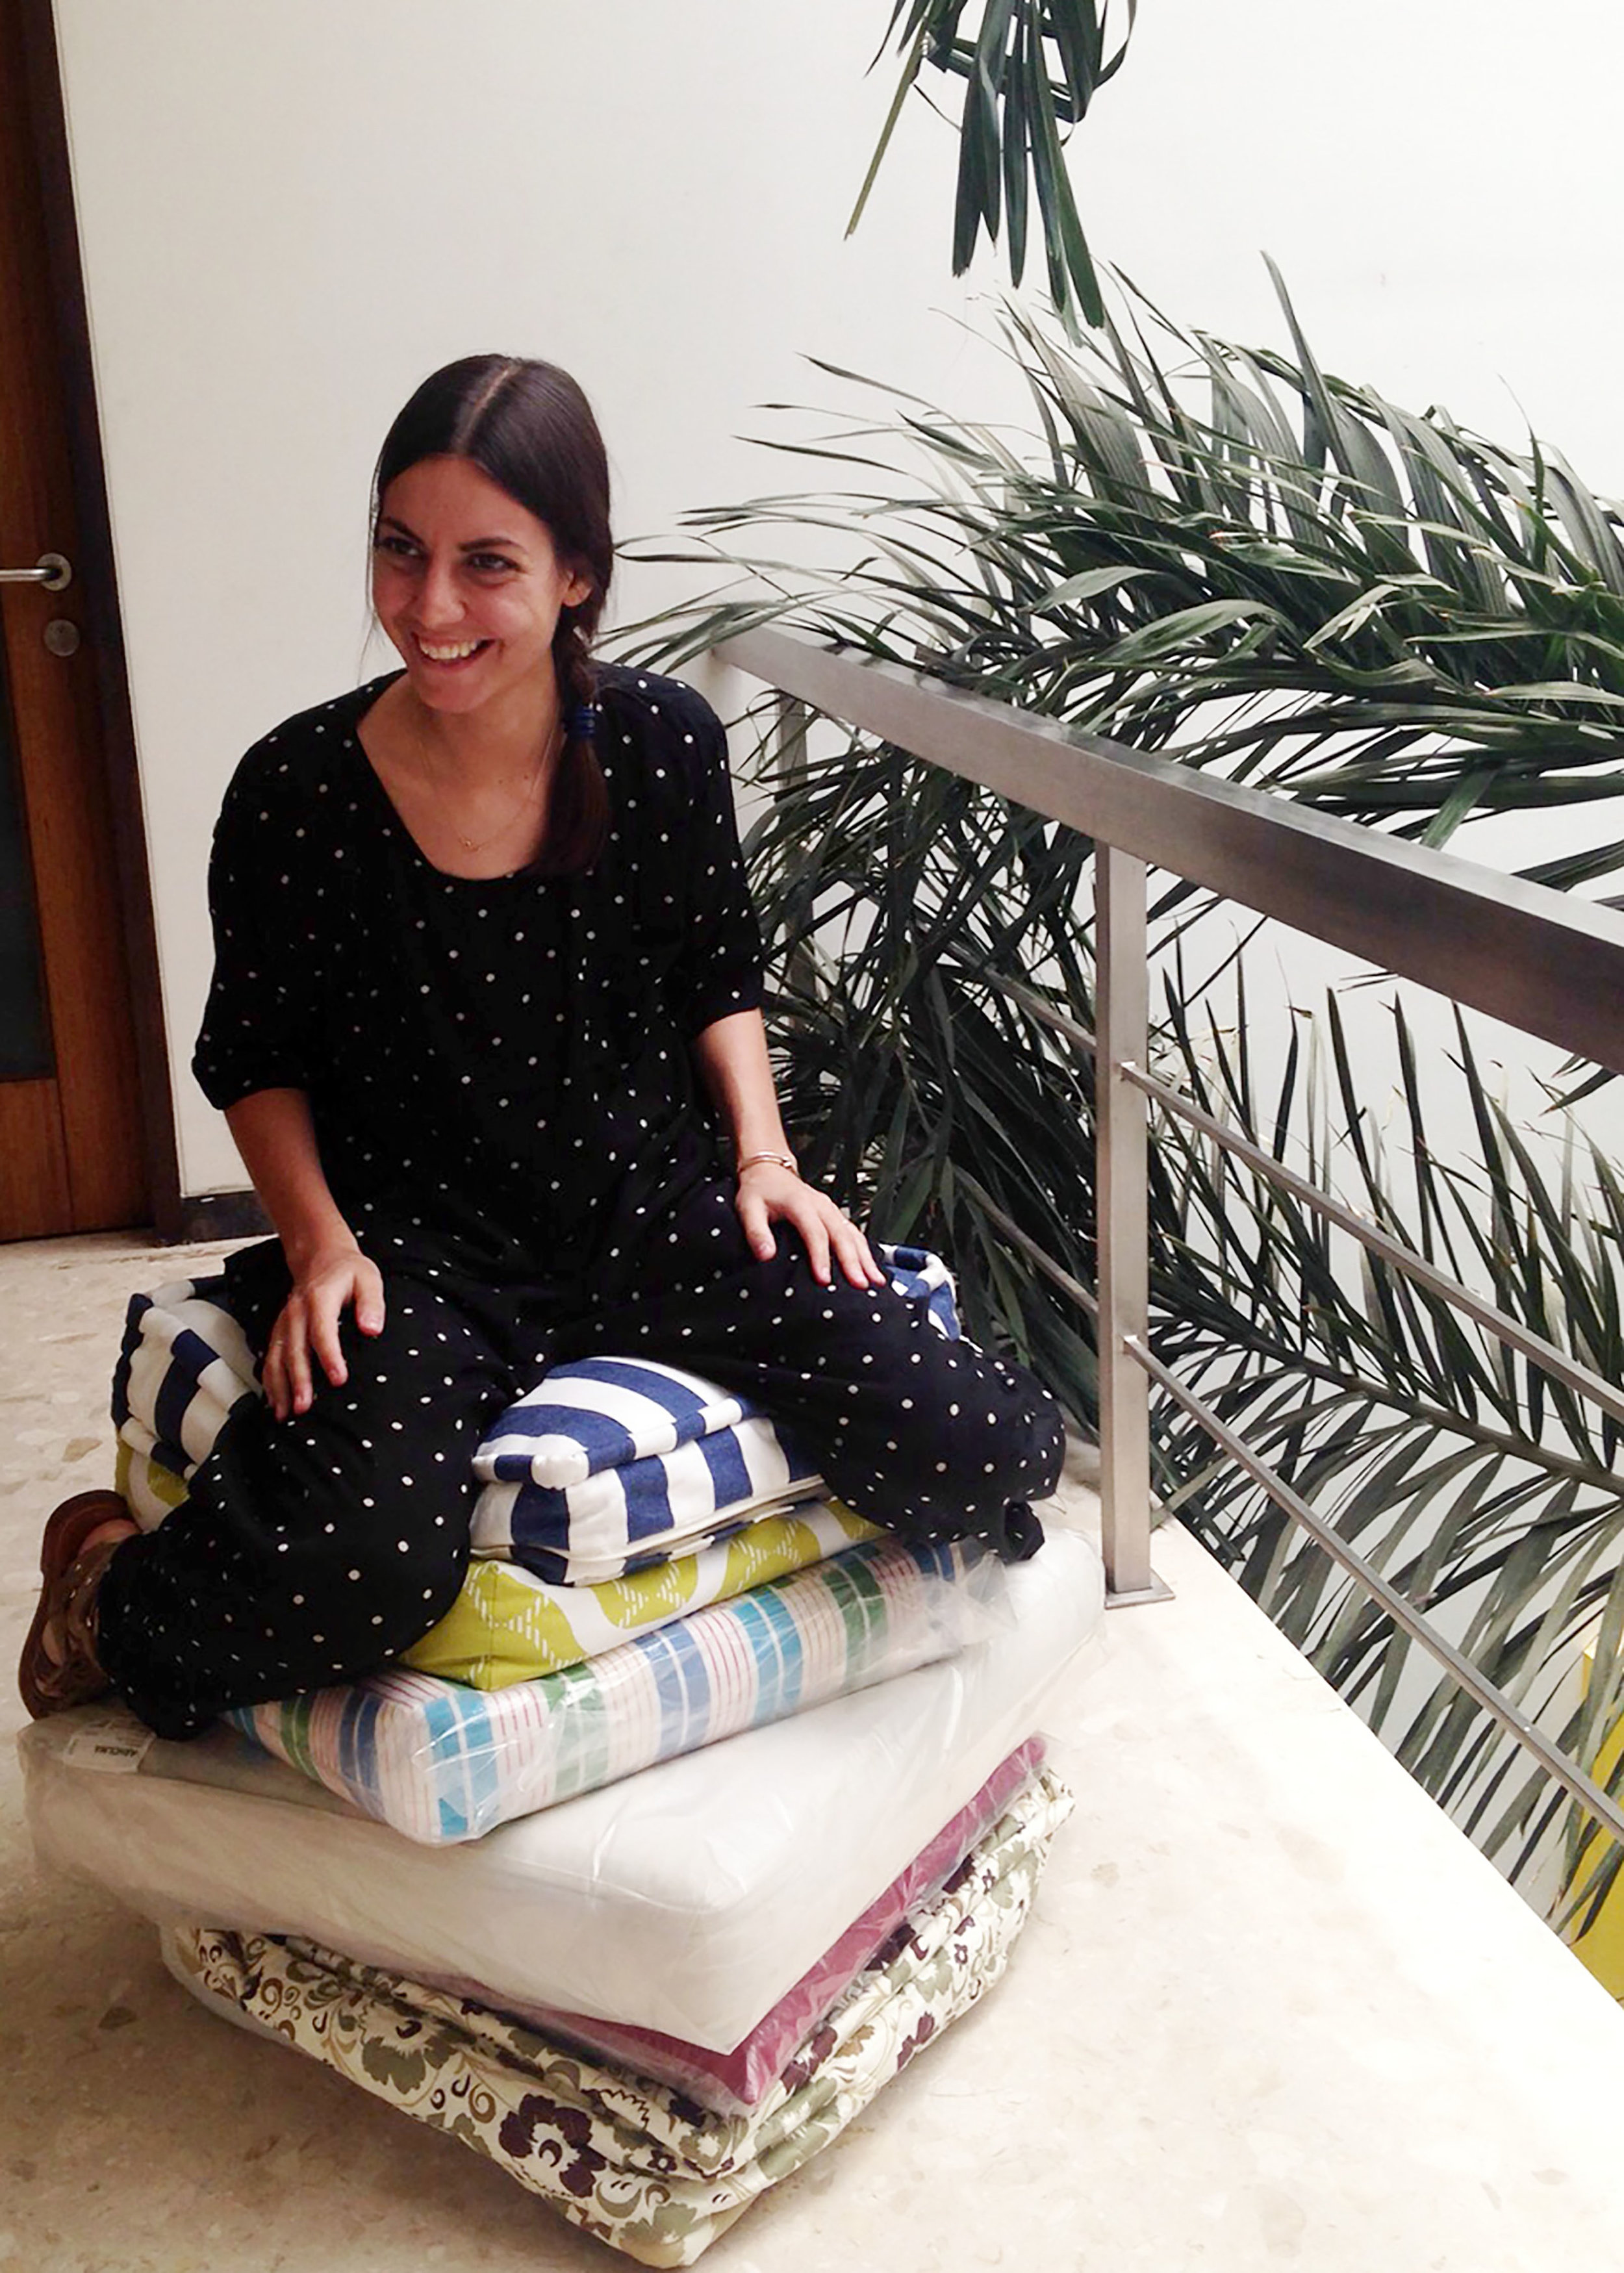 IKEA-JASSA-paulin-machado-testing-cushions-copy.jpg